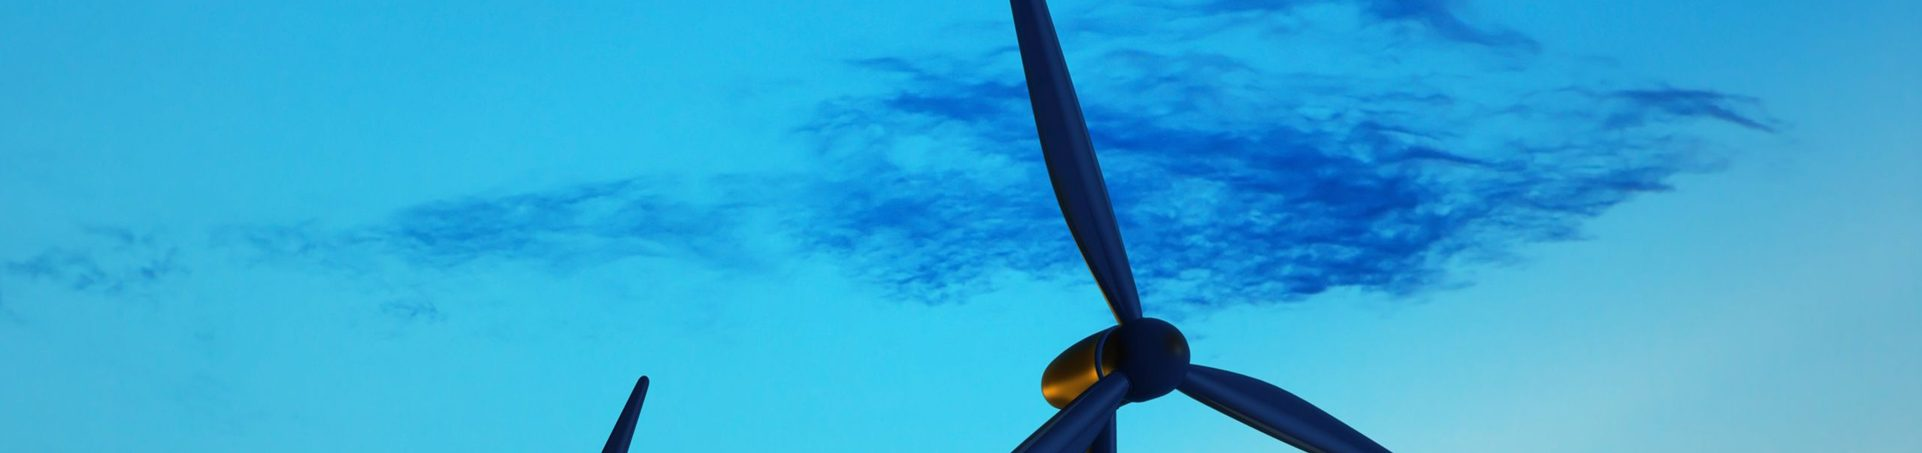 beautiful-wind-turbines-at-night-wide-1-e1490804797785